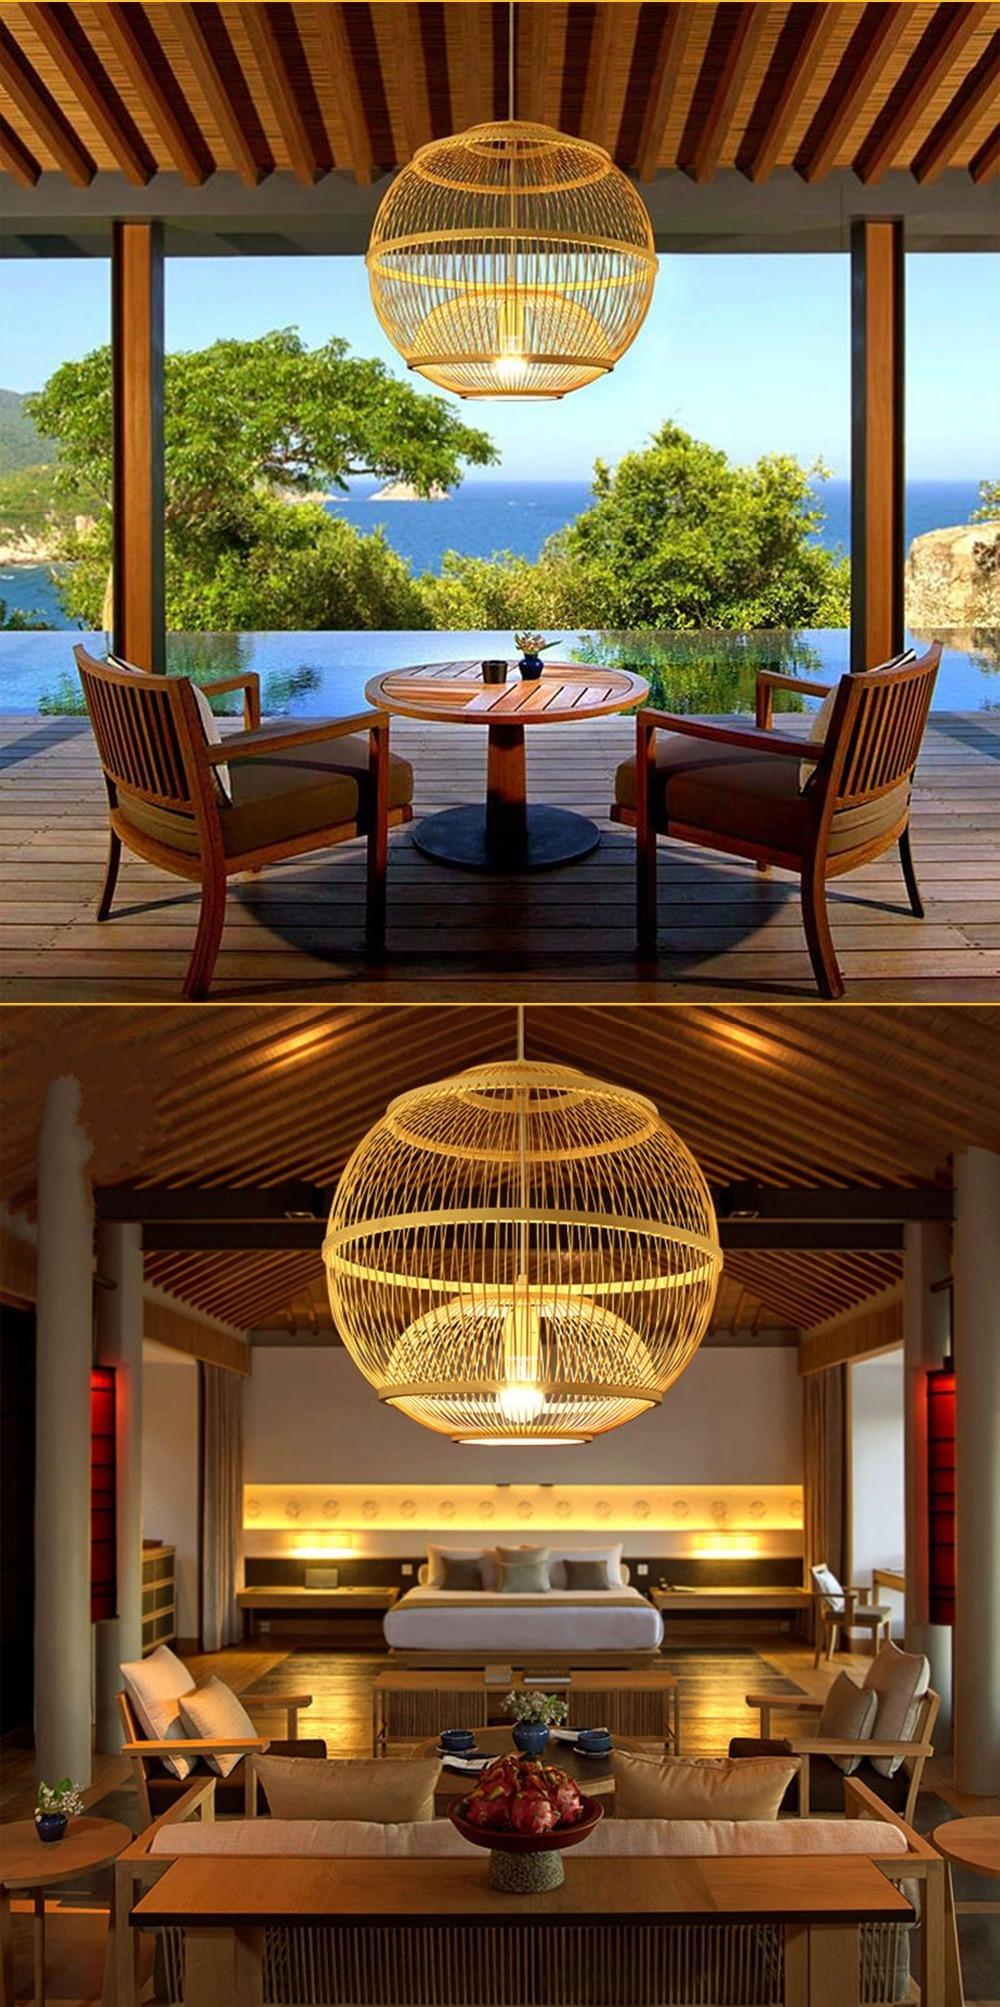 Arturesthome Modern Pendant lights Bamboo lamps For living room Restaurant Rattan light kitchen light lamp fixtures hanging